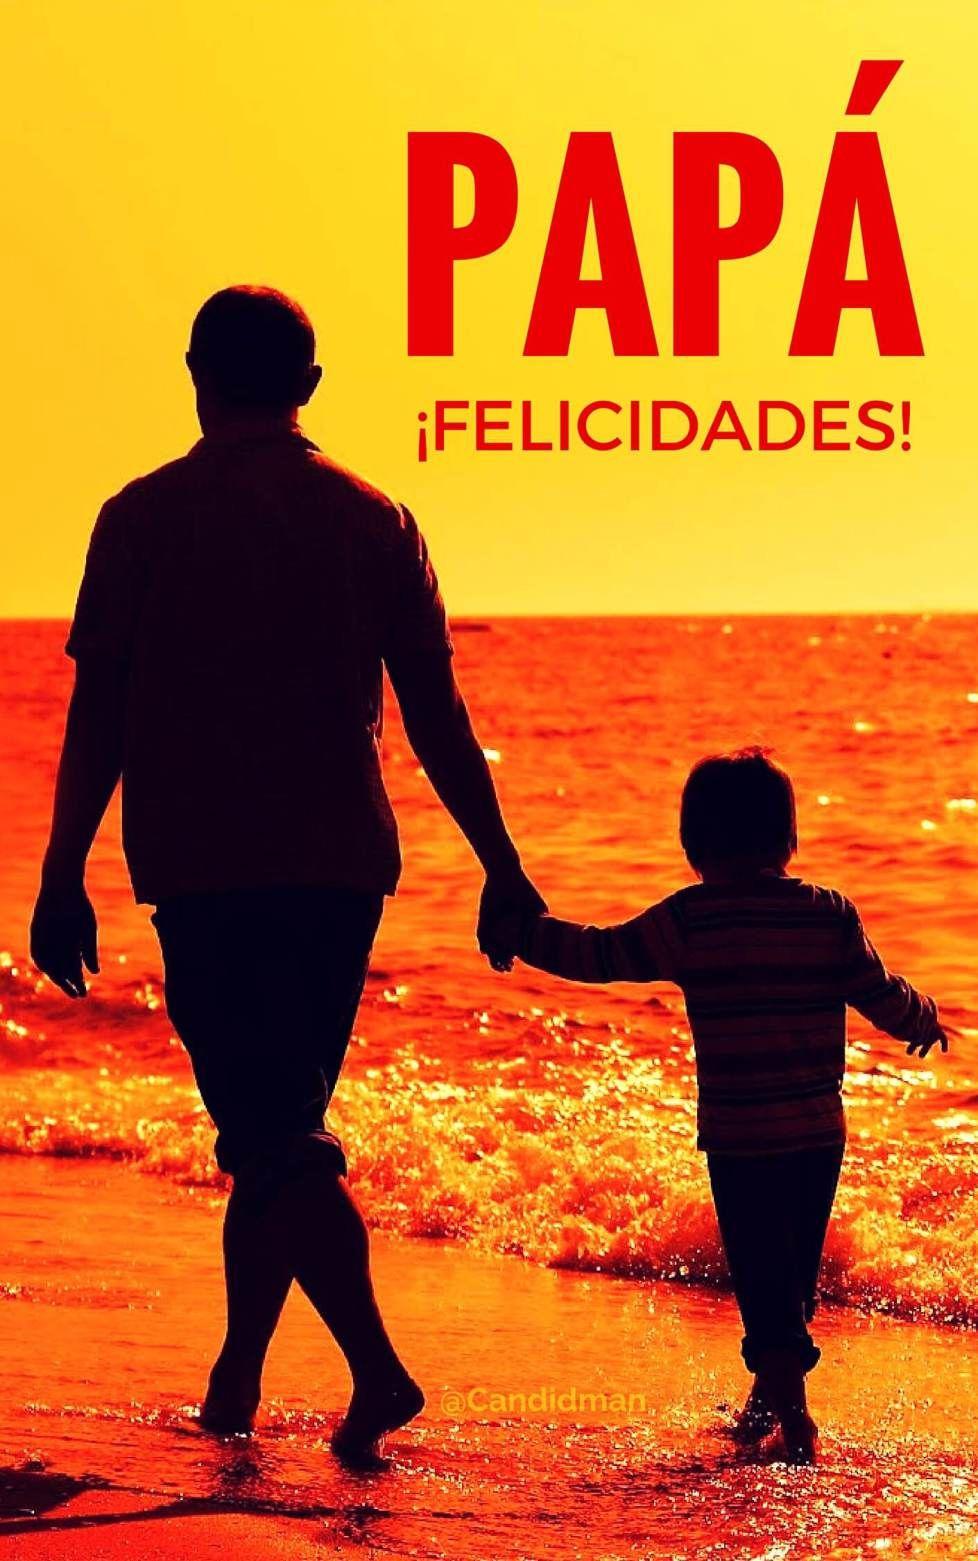 20150621 Papá ¡Felicidades! @Candidman